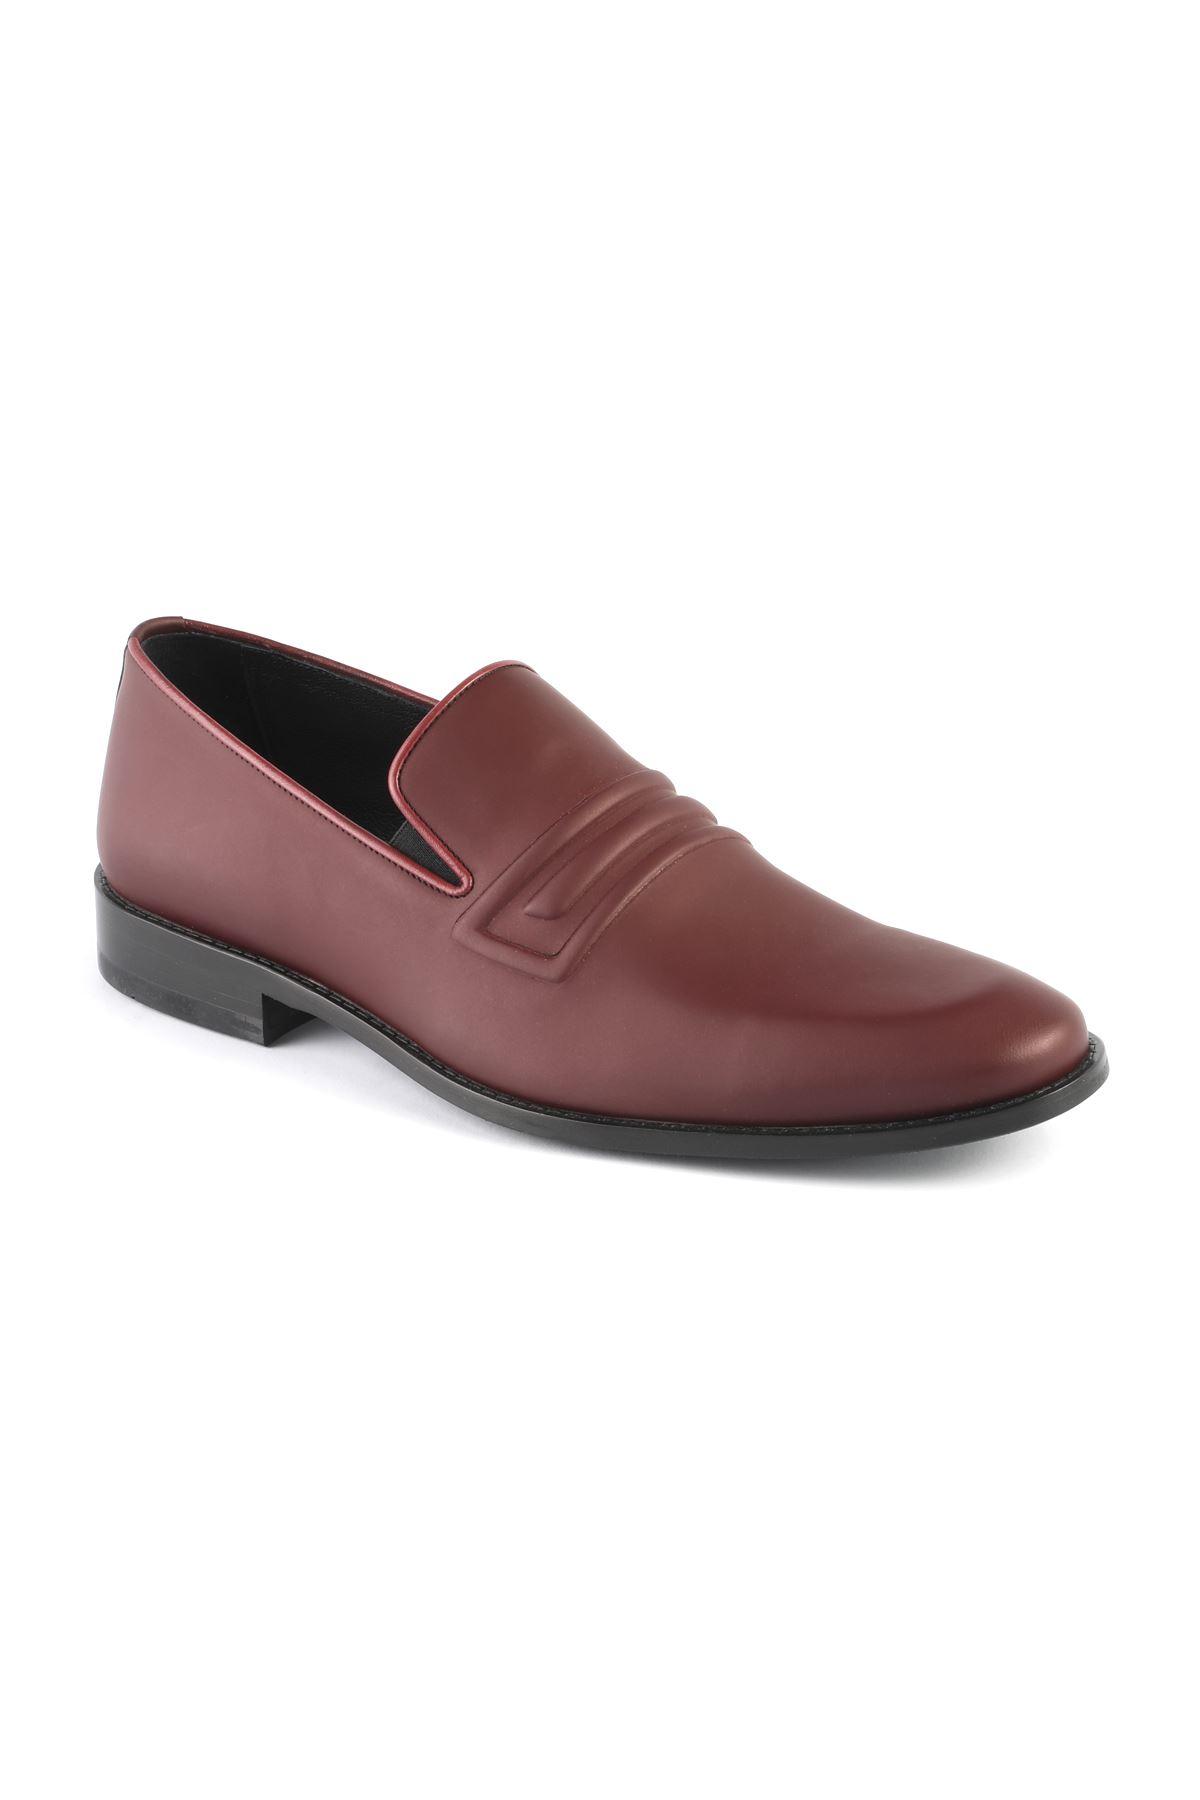 Libero T1099 Claret Red Classic Shoes